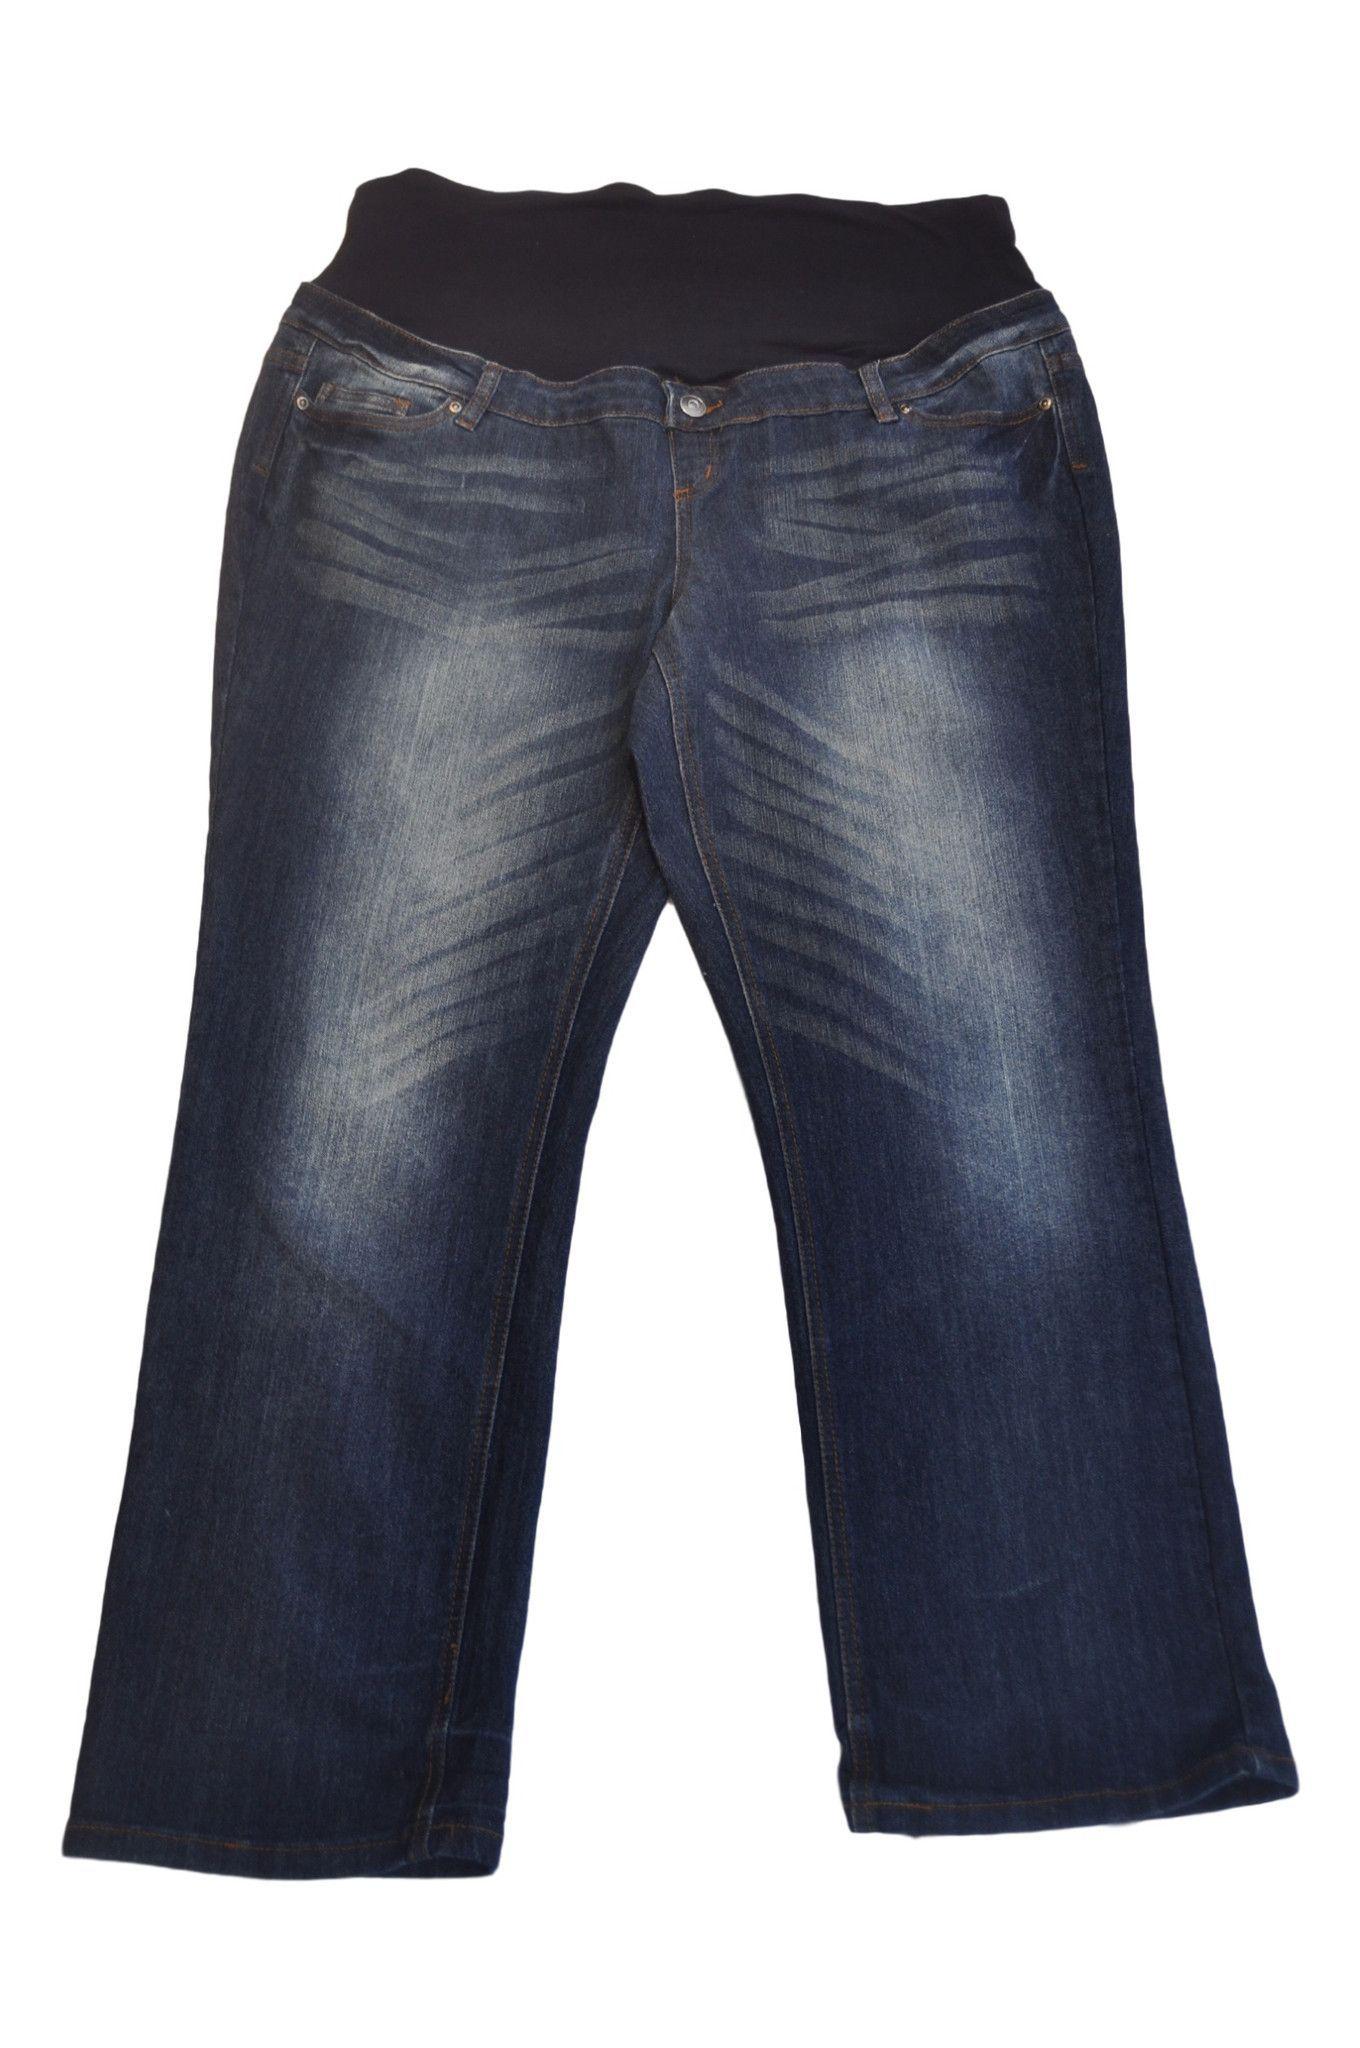 PLANET MOTHERHOOD Jeans Size 2X